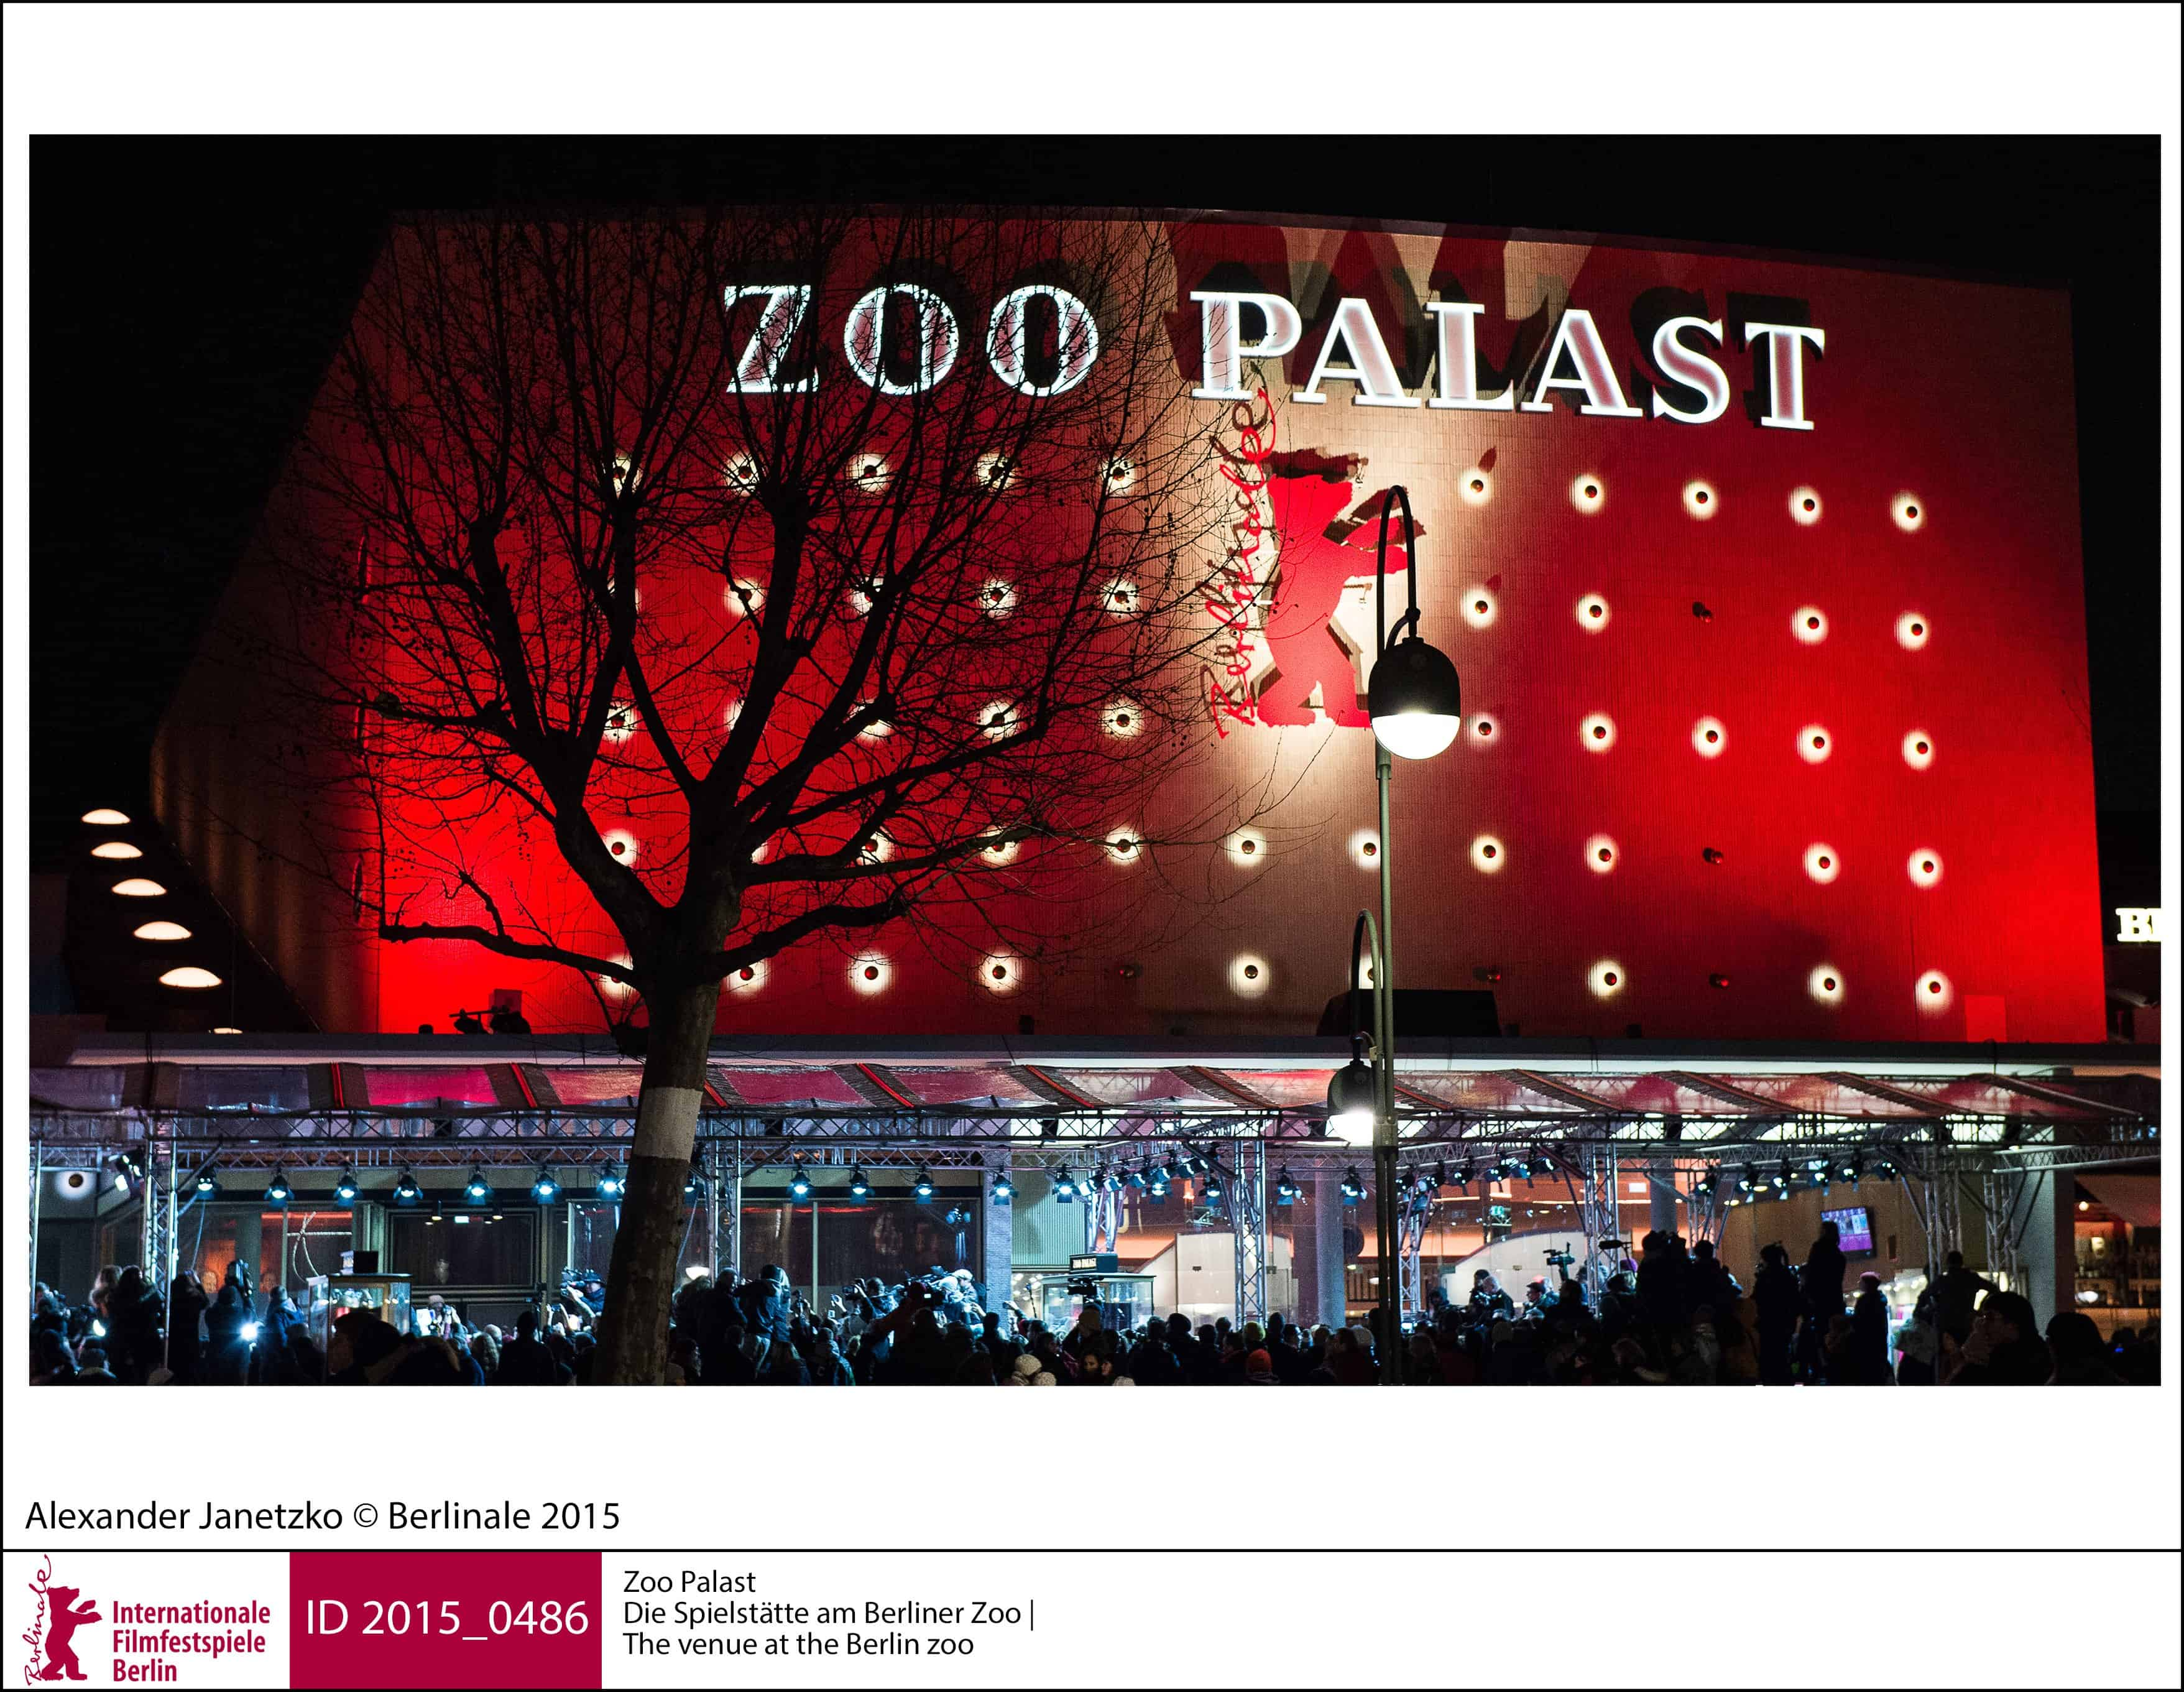 Indgangspartiet til Zoo Palast ved Berliner Zoo